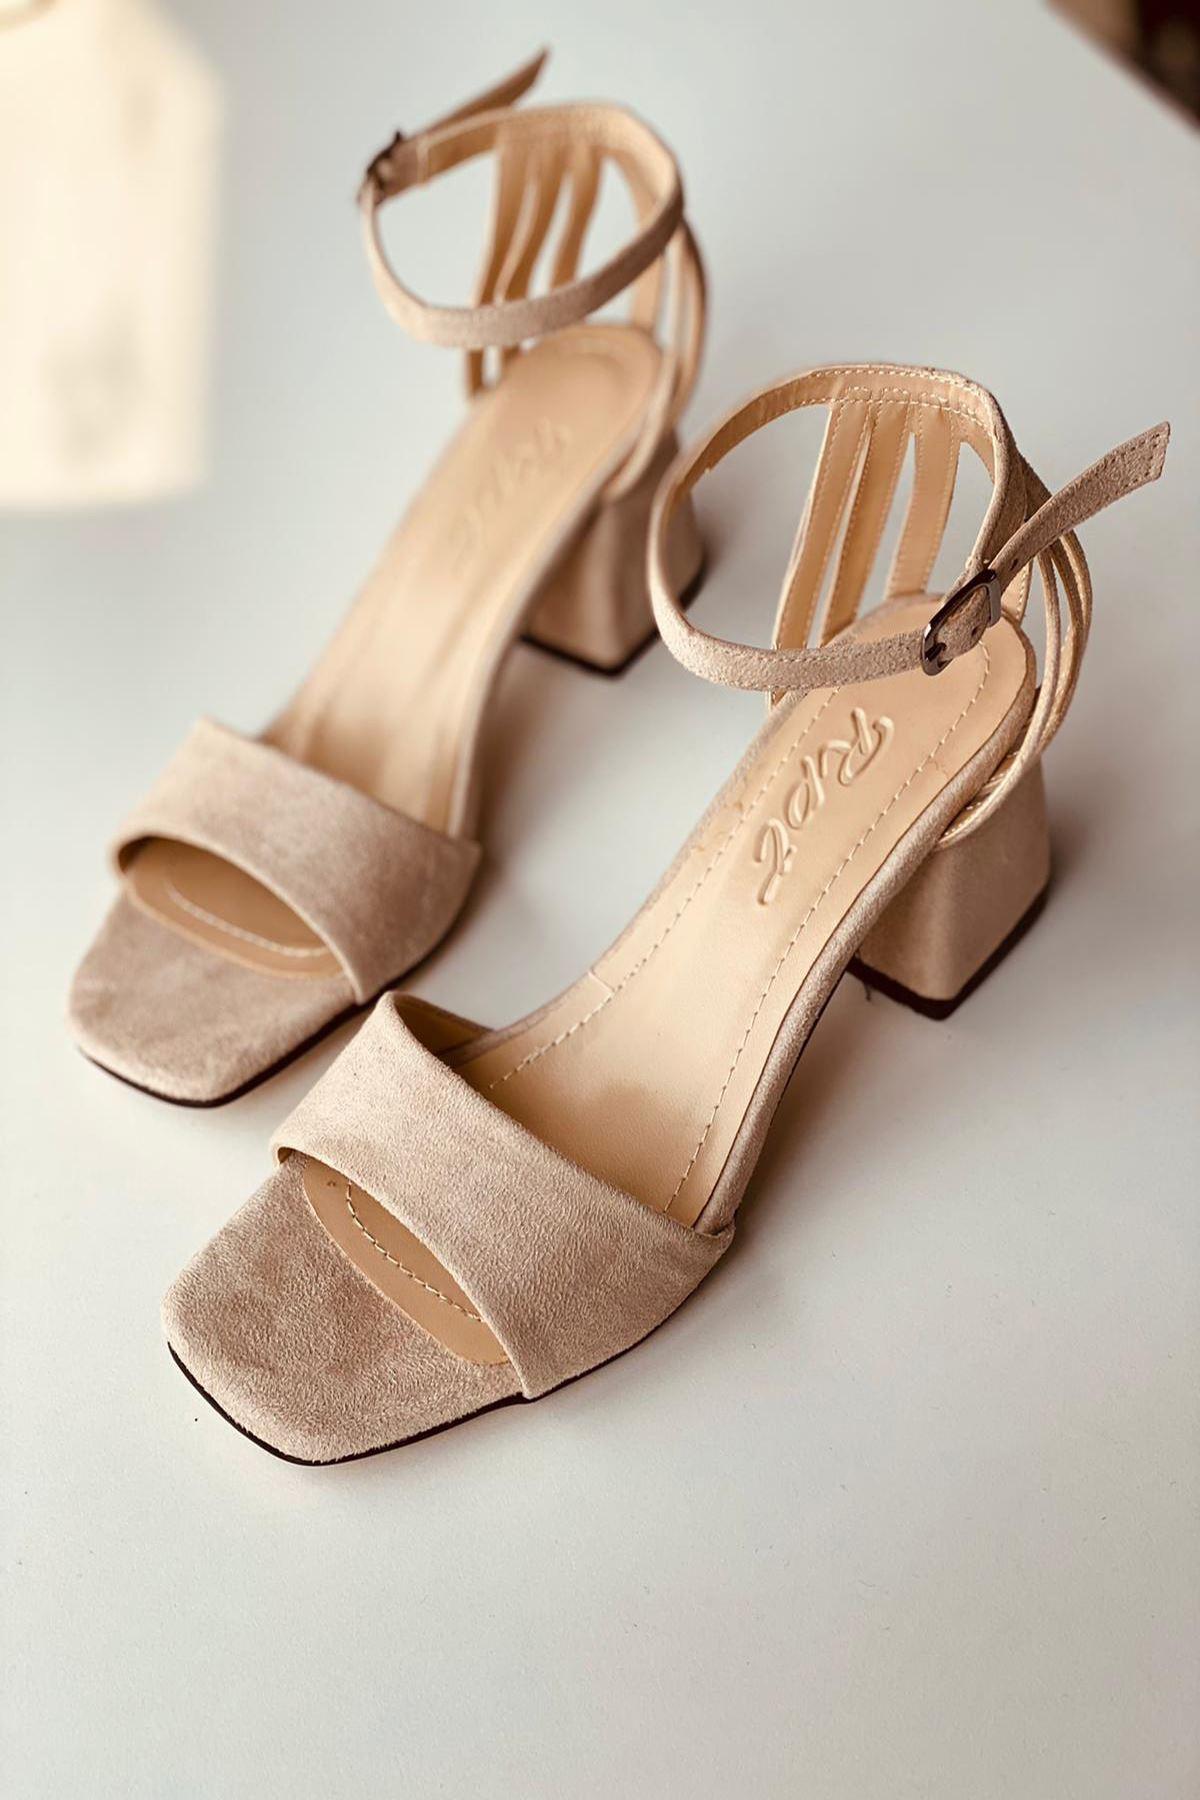 Y901 Pudra Süet Topuklu Ayakkabı